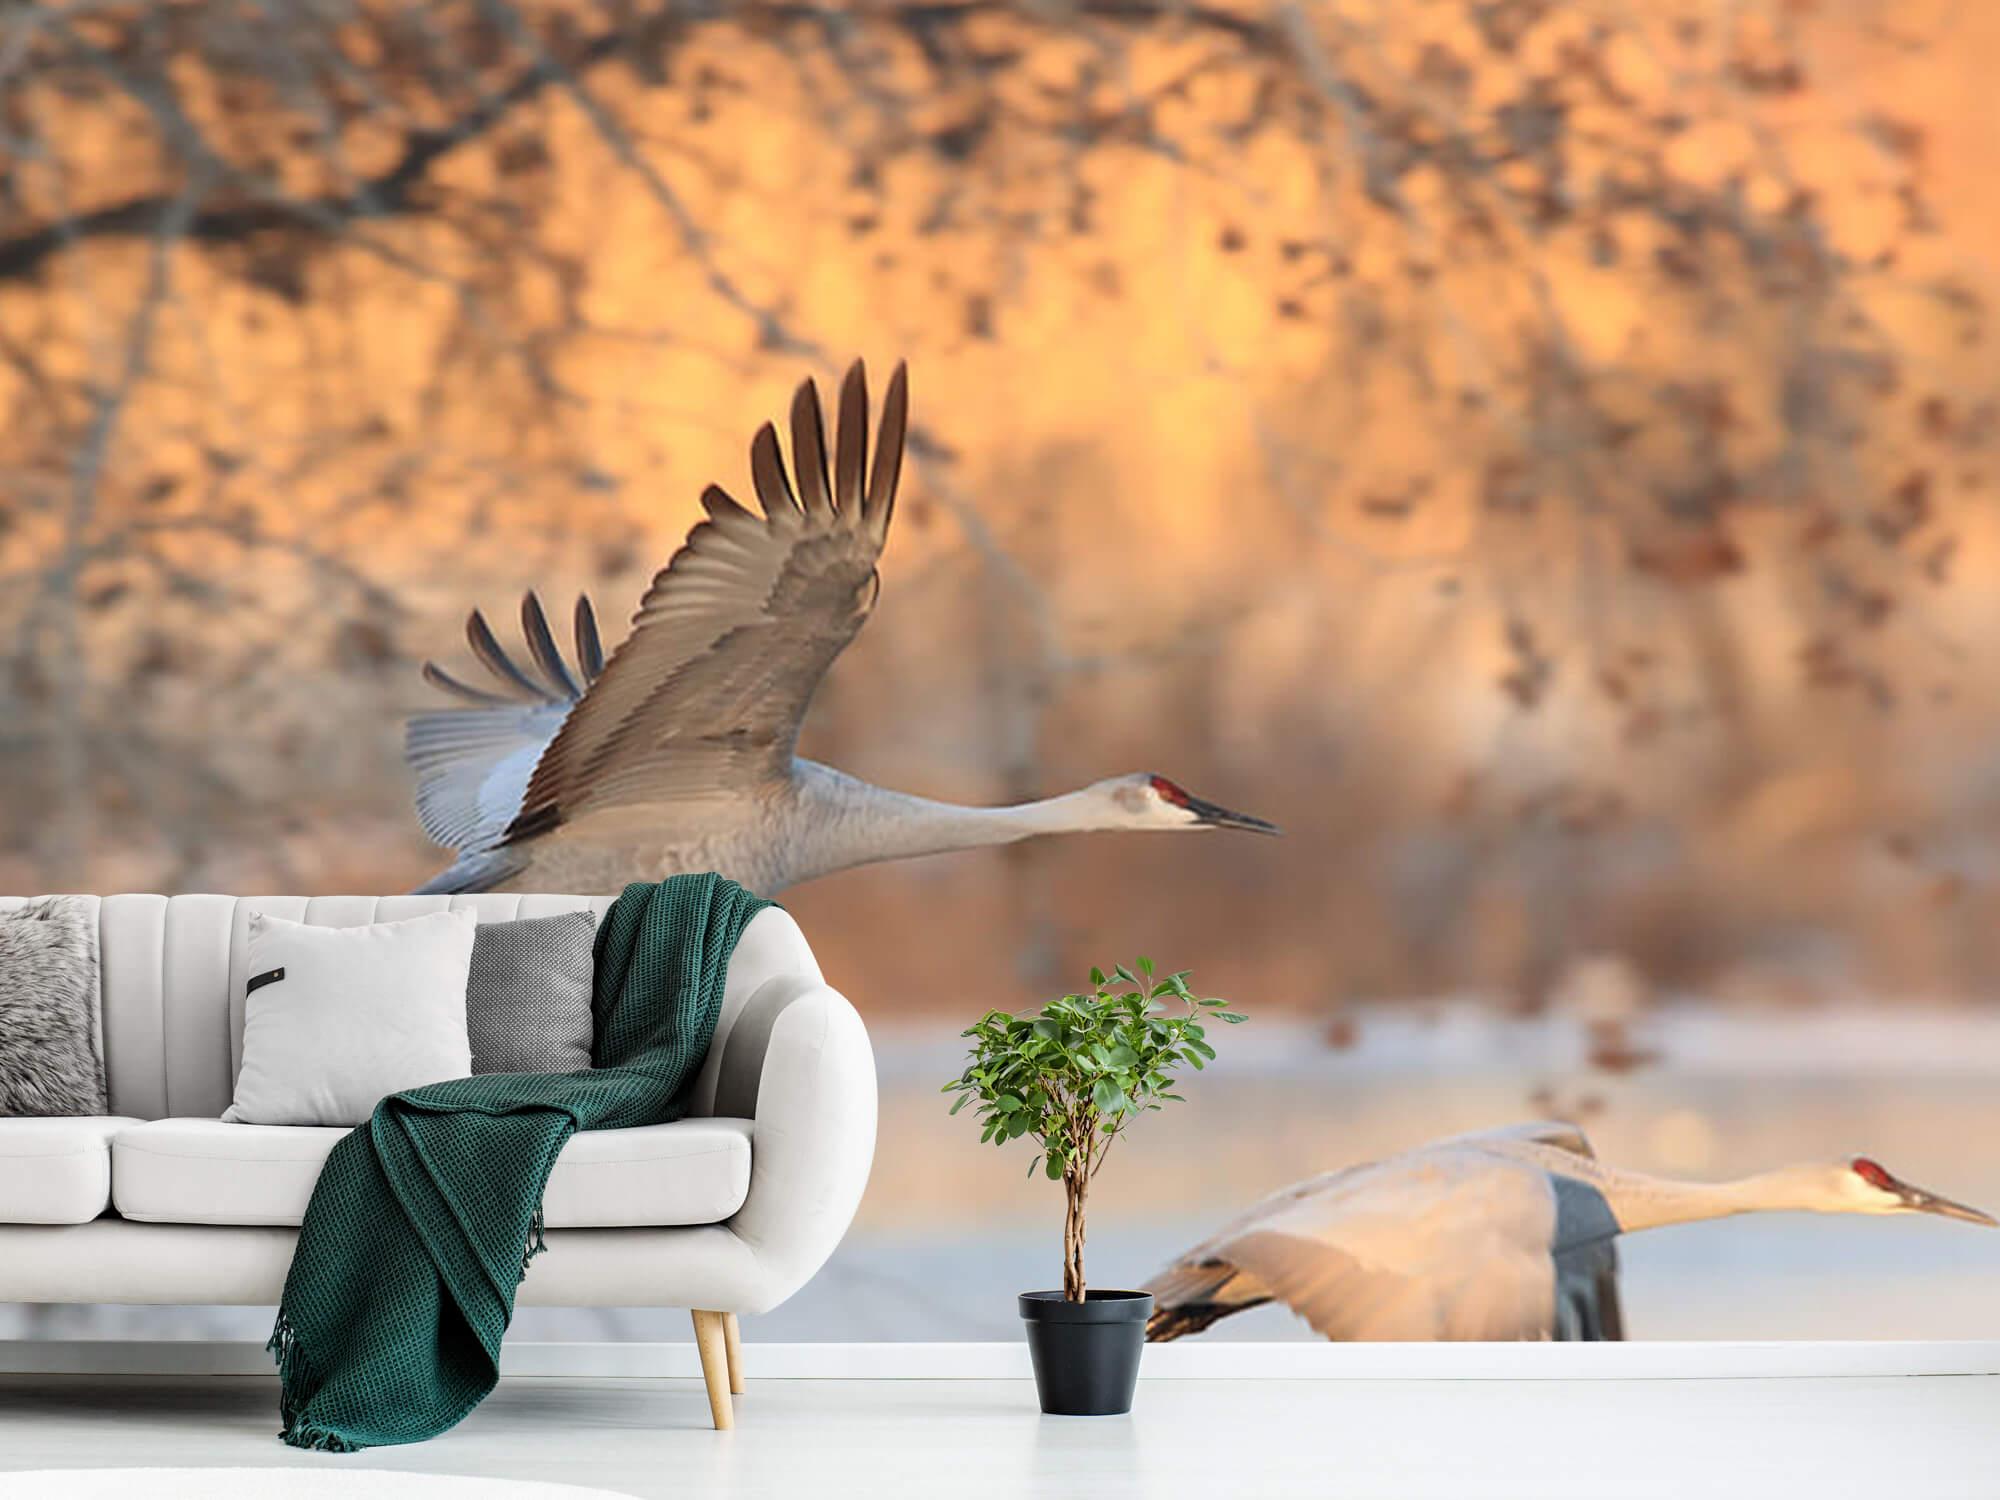 Vliegende kraanvogels 10